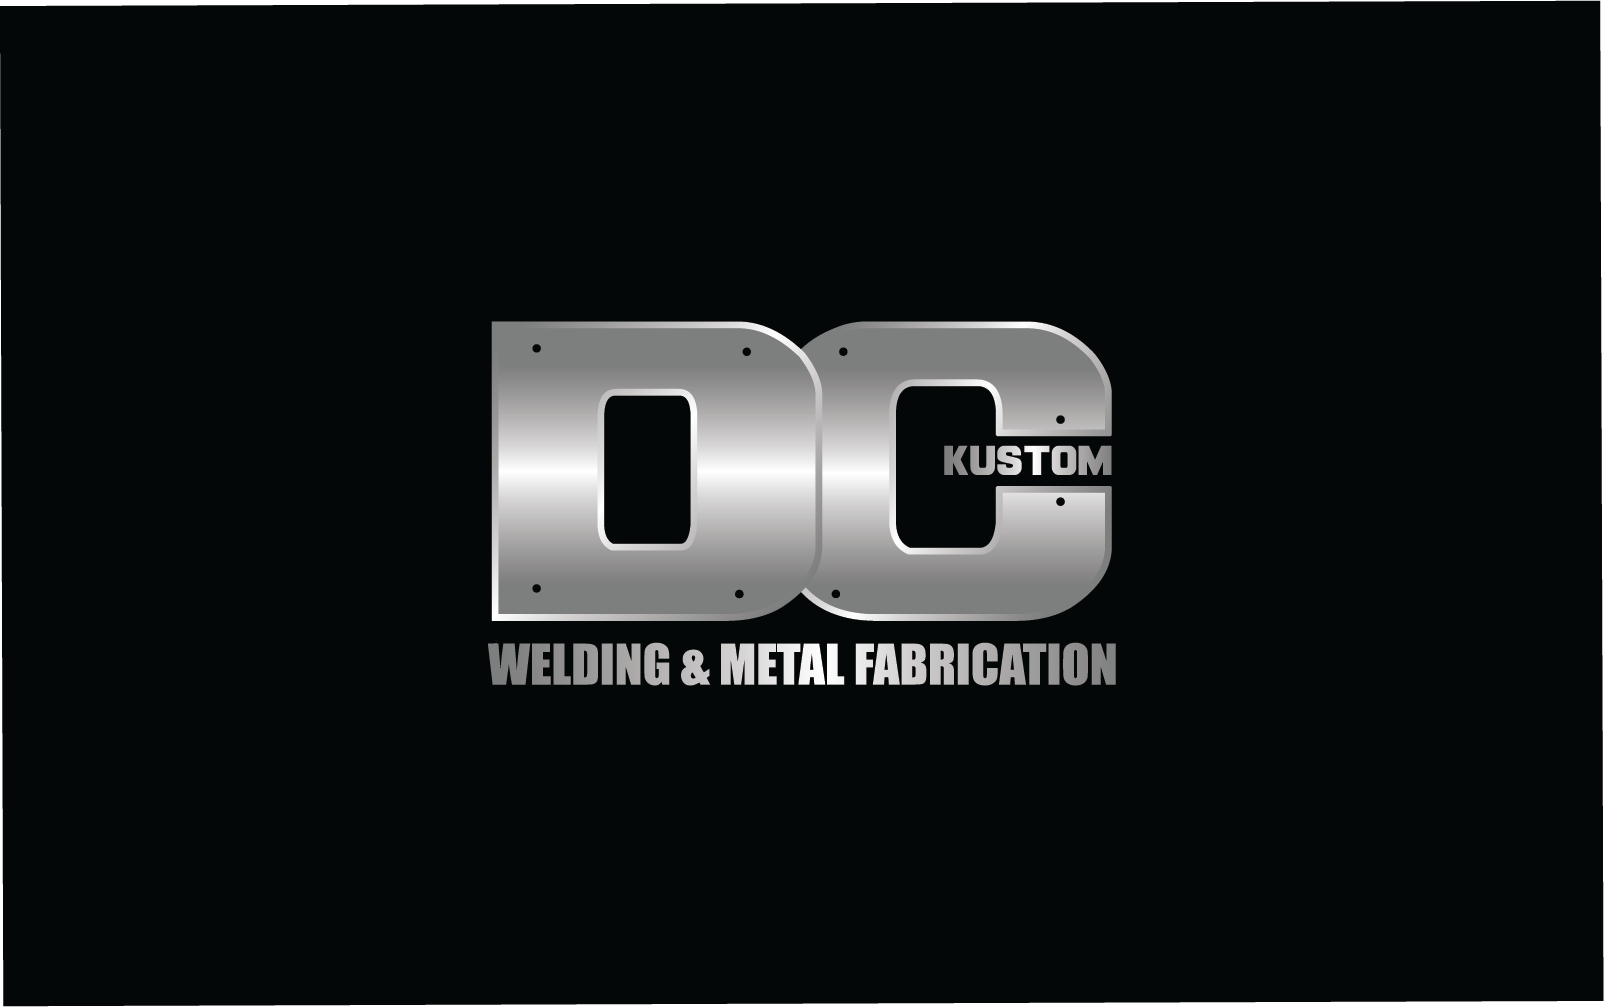 Logo Design by pojas12 - Entry No. 86 in the Logo Design Contest Imaginative Logo Design for DC KUSTOM WELDING & METAL FABRICATION.